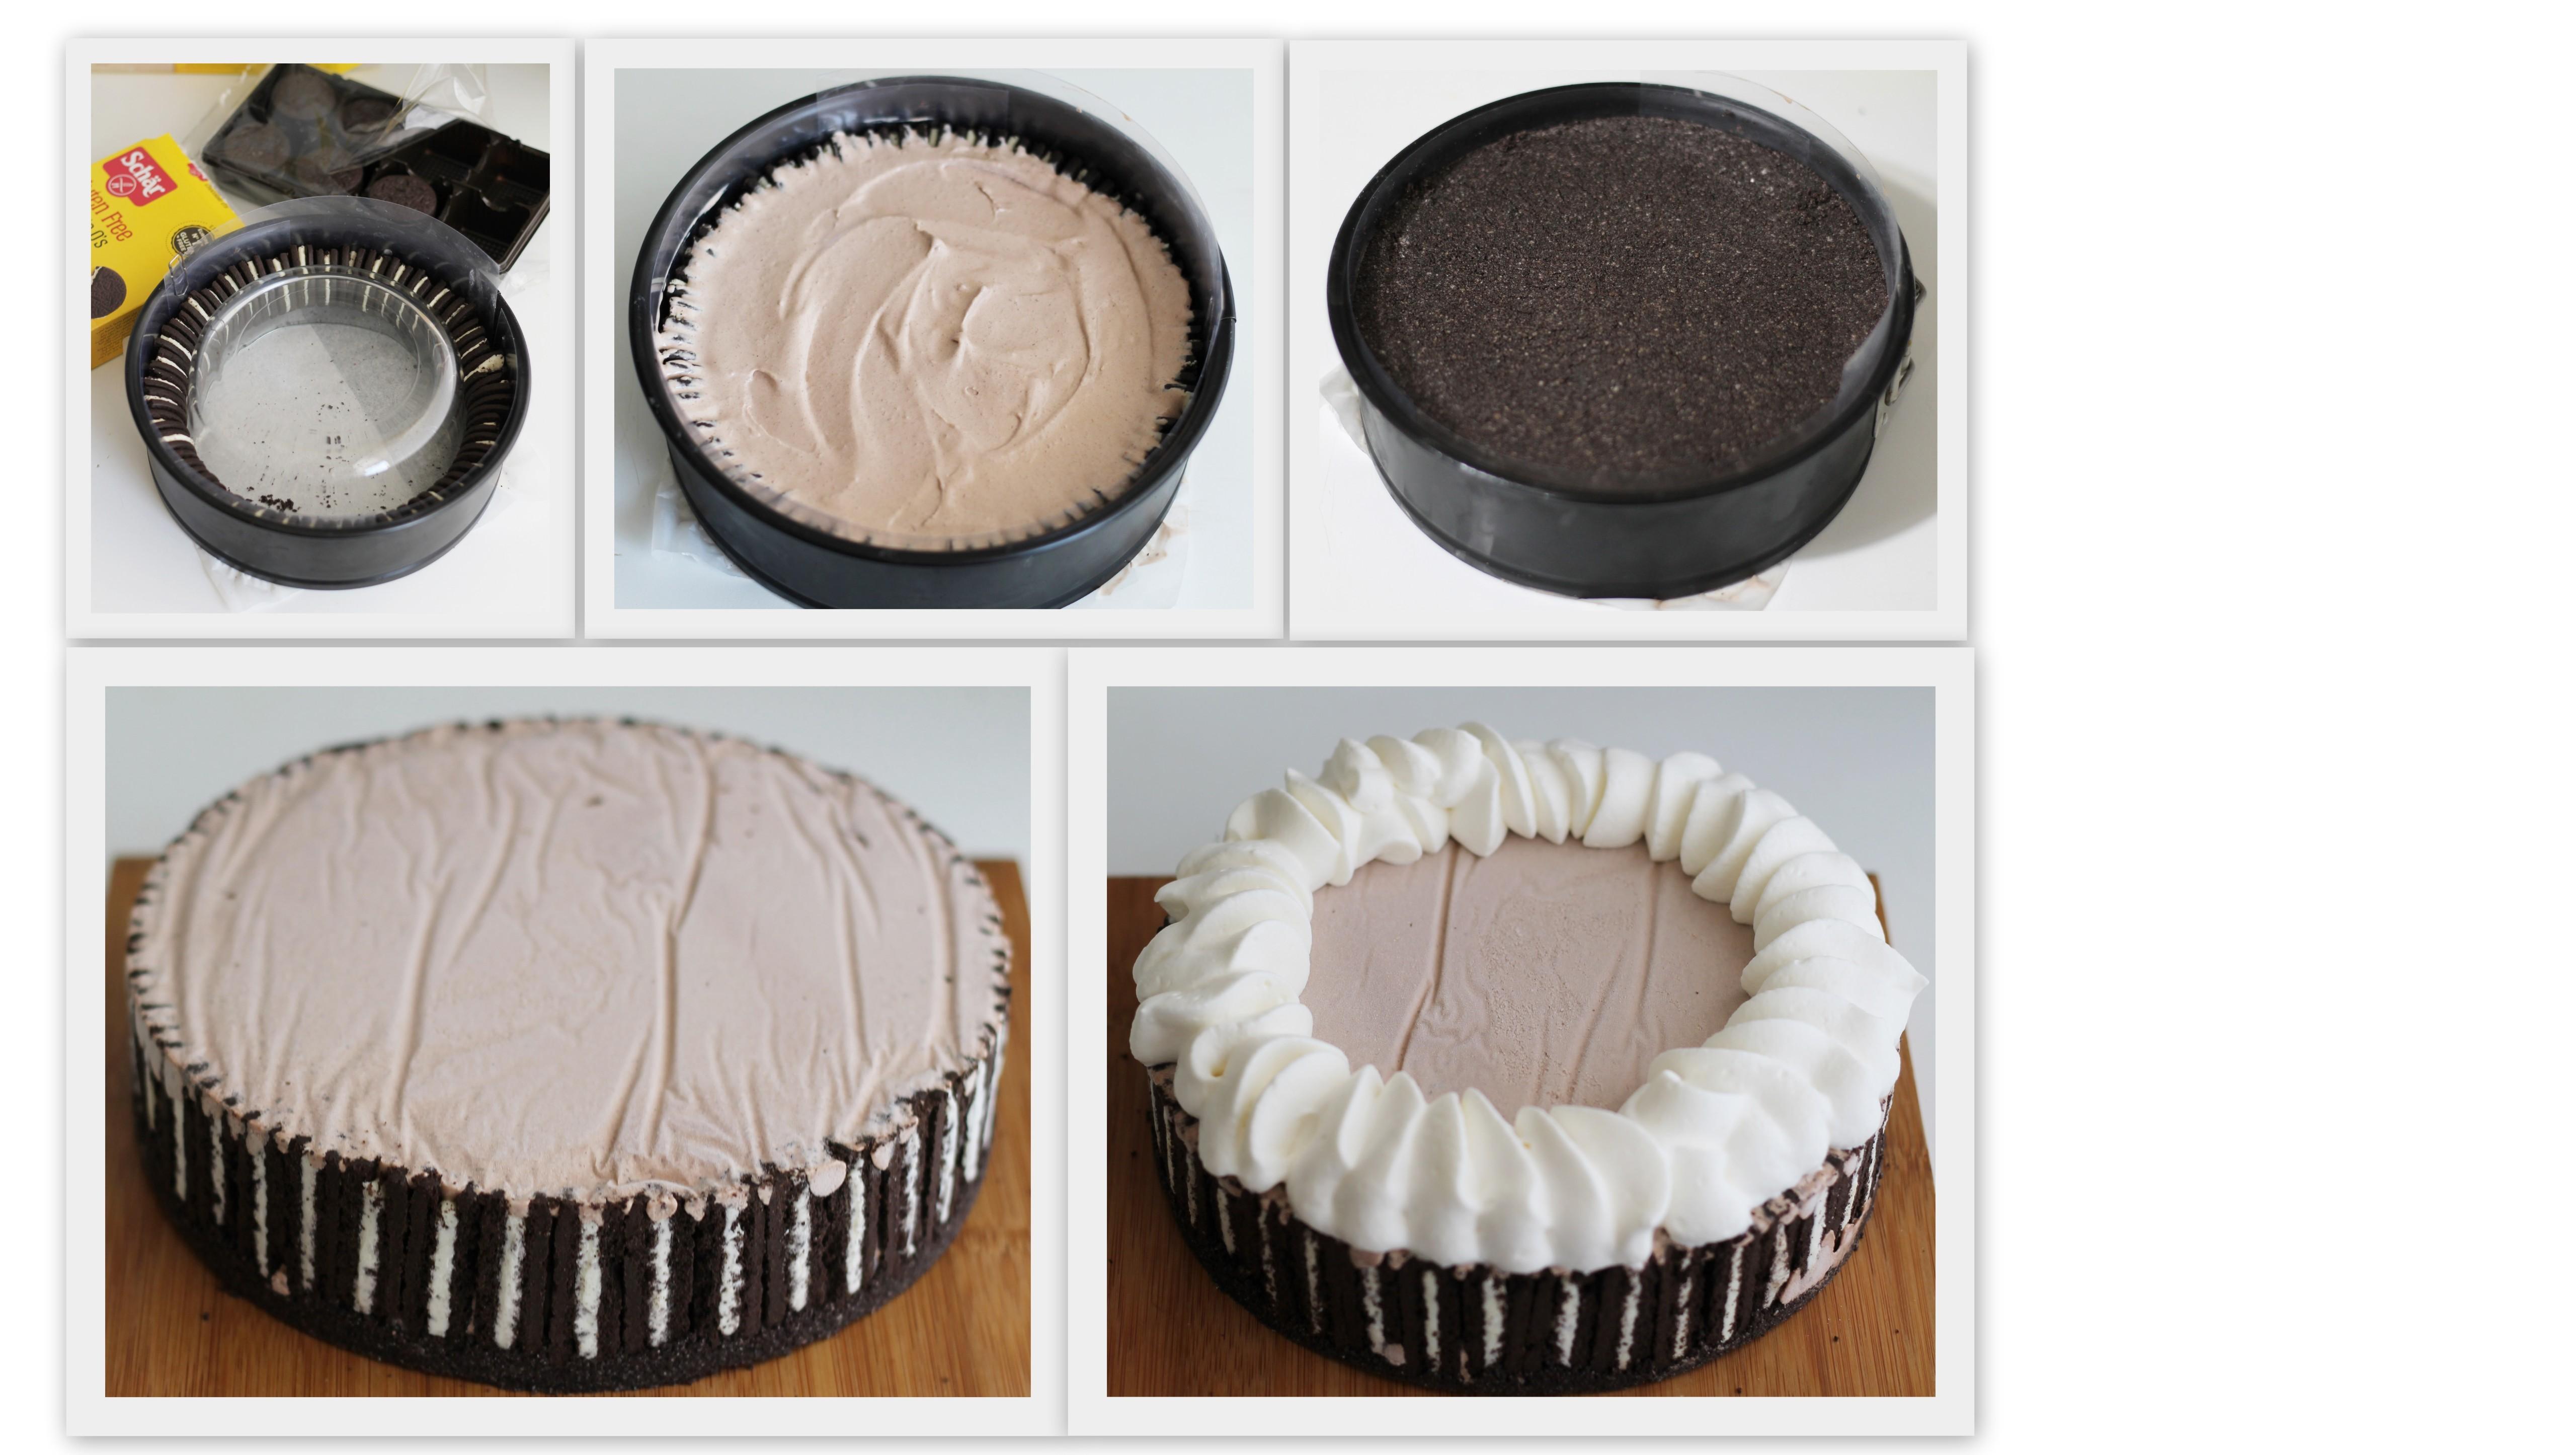 Gâteau glacé Oreo sans gluten - La Cassata